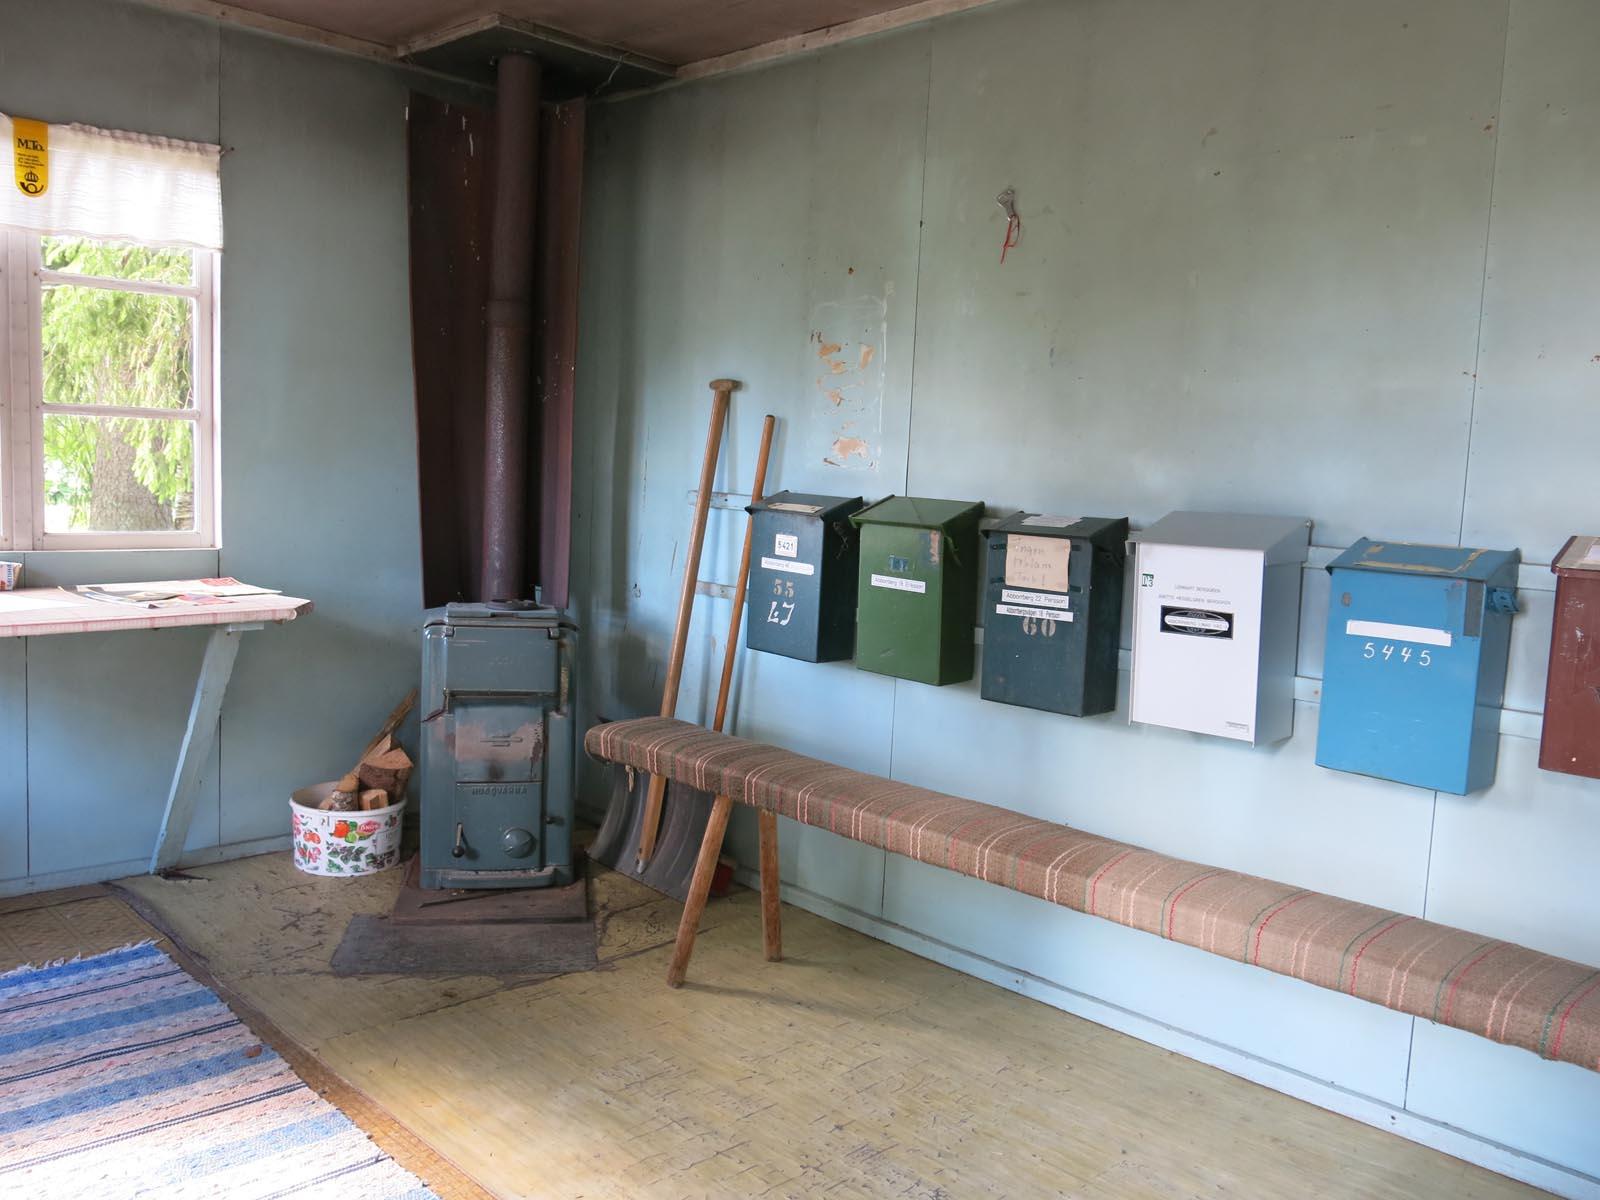 Posthuset i Abborrberg